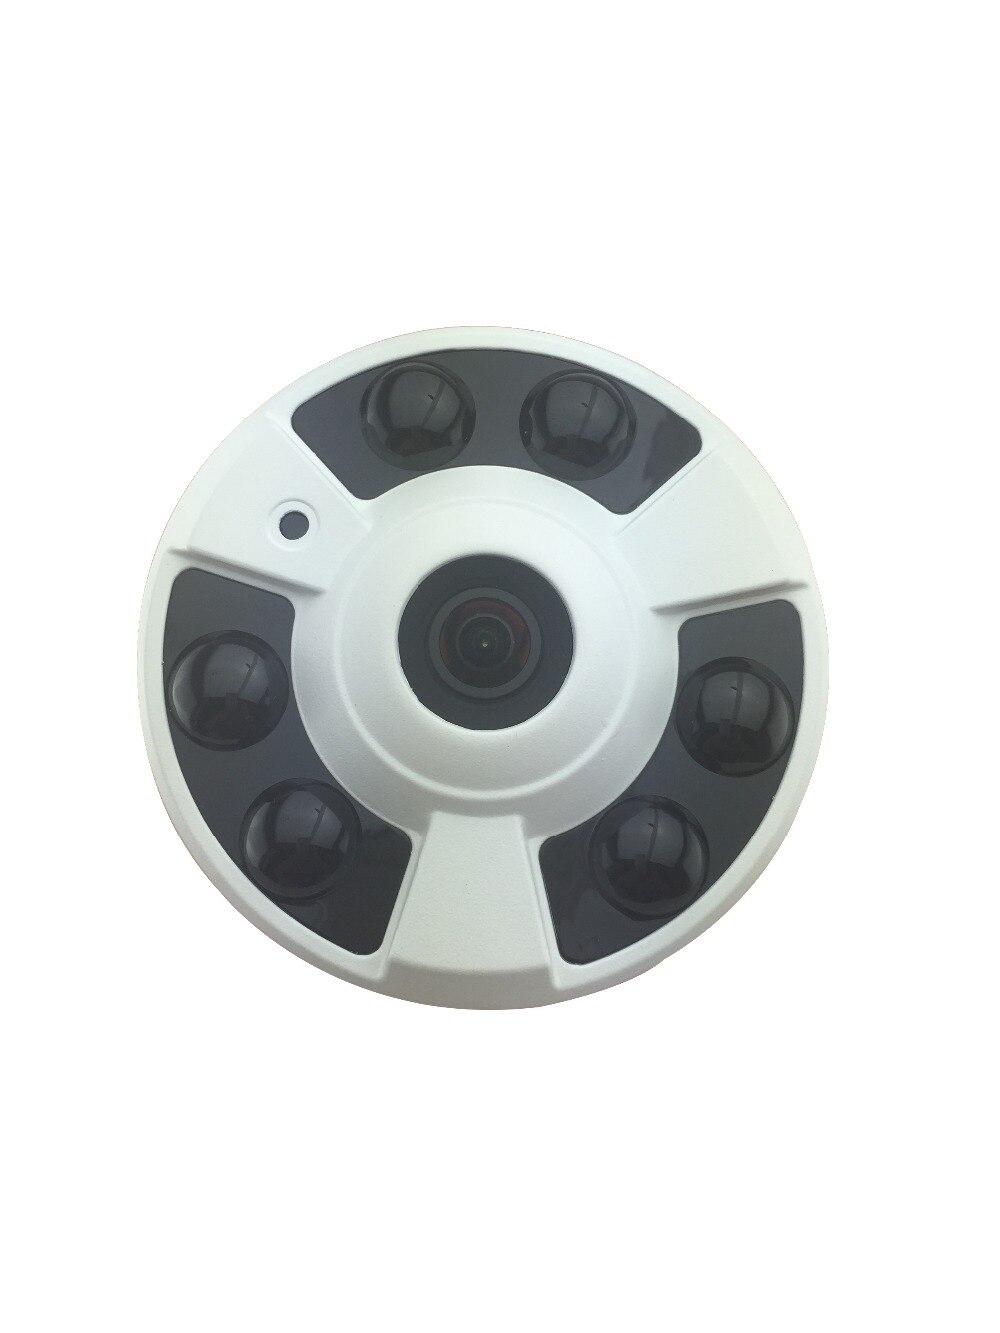 Wide Angle Fisheye 180 Degree HD 1080P IP Camera Indoor Security Network P2P 6 IR Night